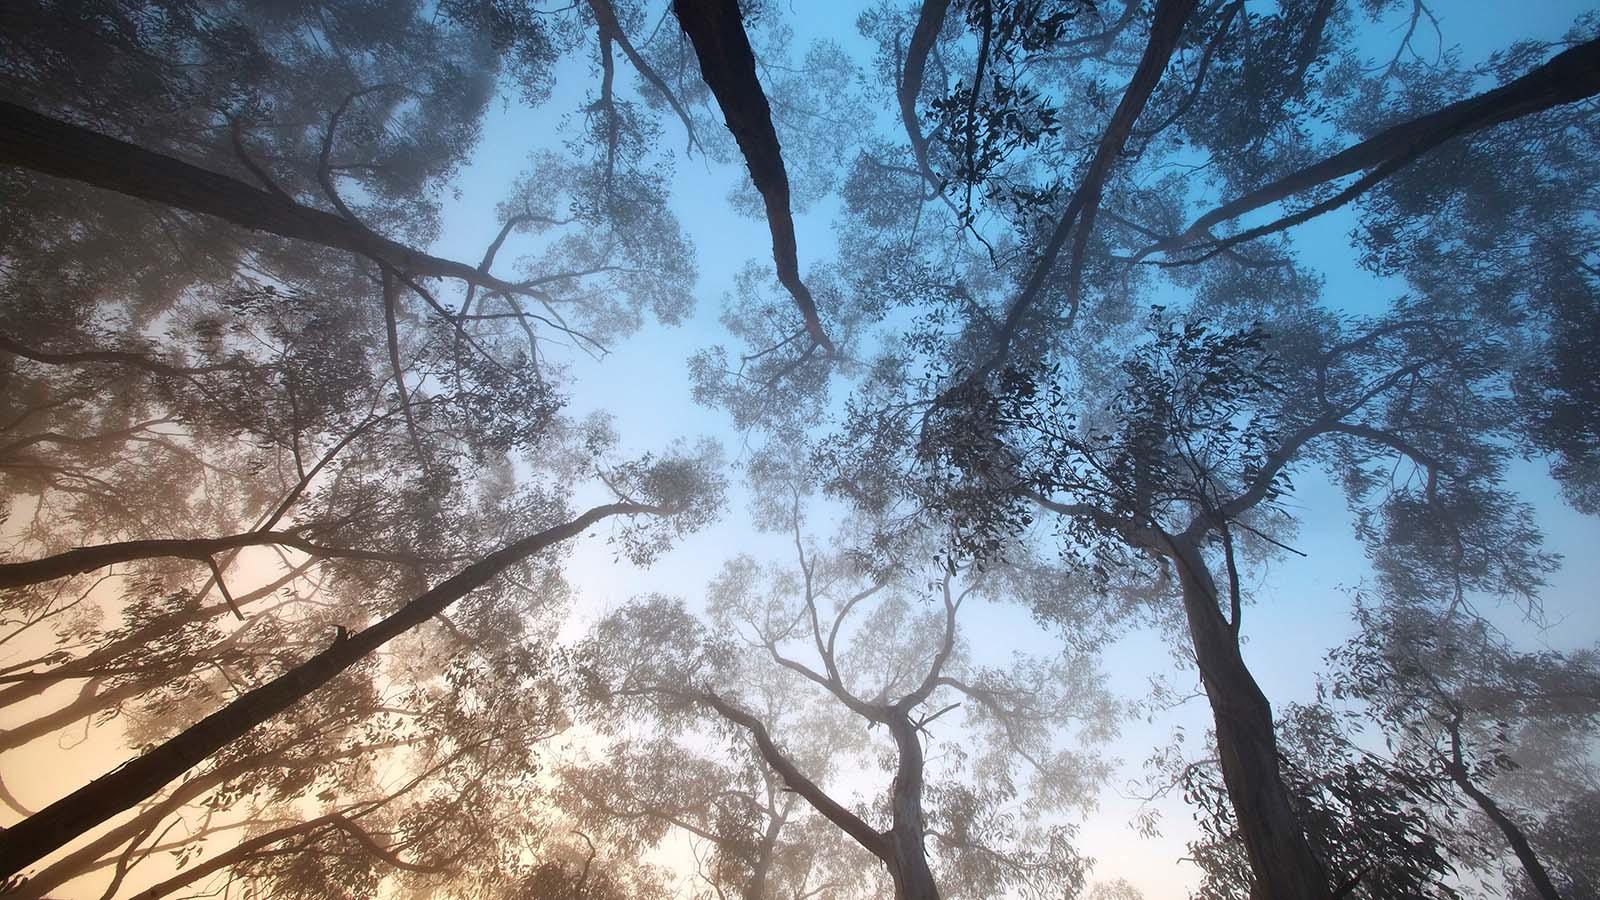 Misty morning at Boroka Lookout, Grampians, Victoria, Australia